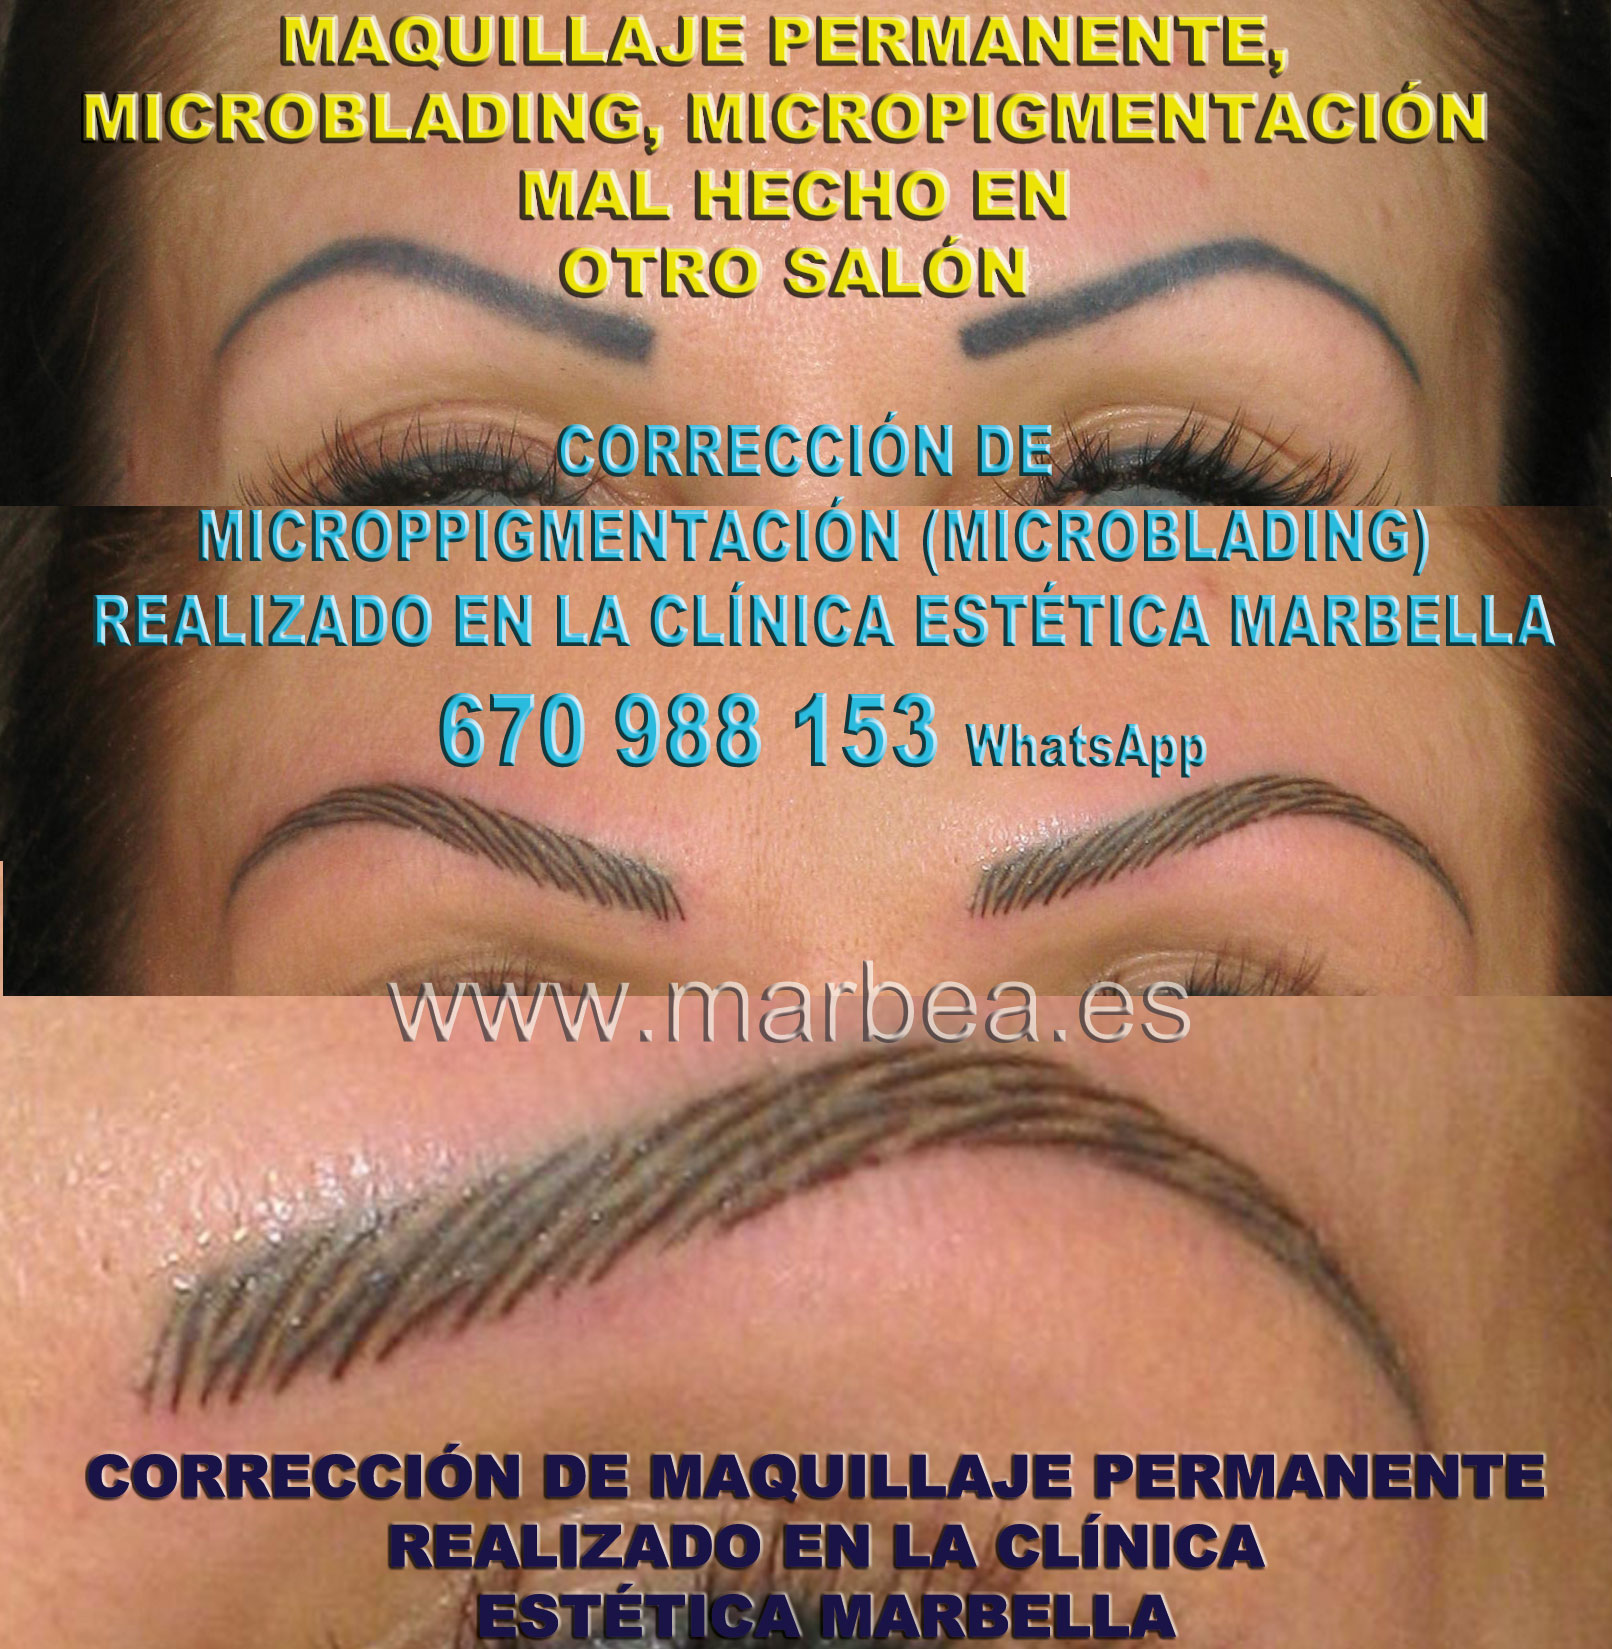 ELIMINAR TATUAJE CEJAS clínica estética tatuaje ofrenda corrección de cejas mal tatuadas,corregir micropigmentación mal hecha